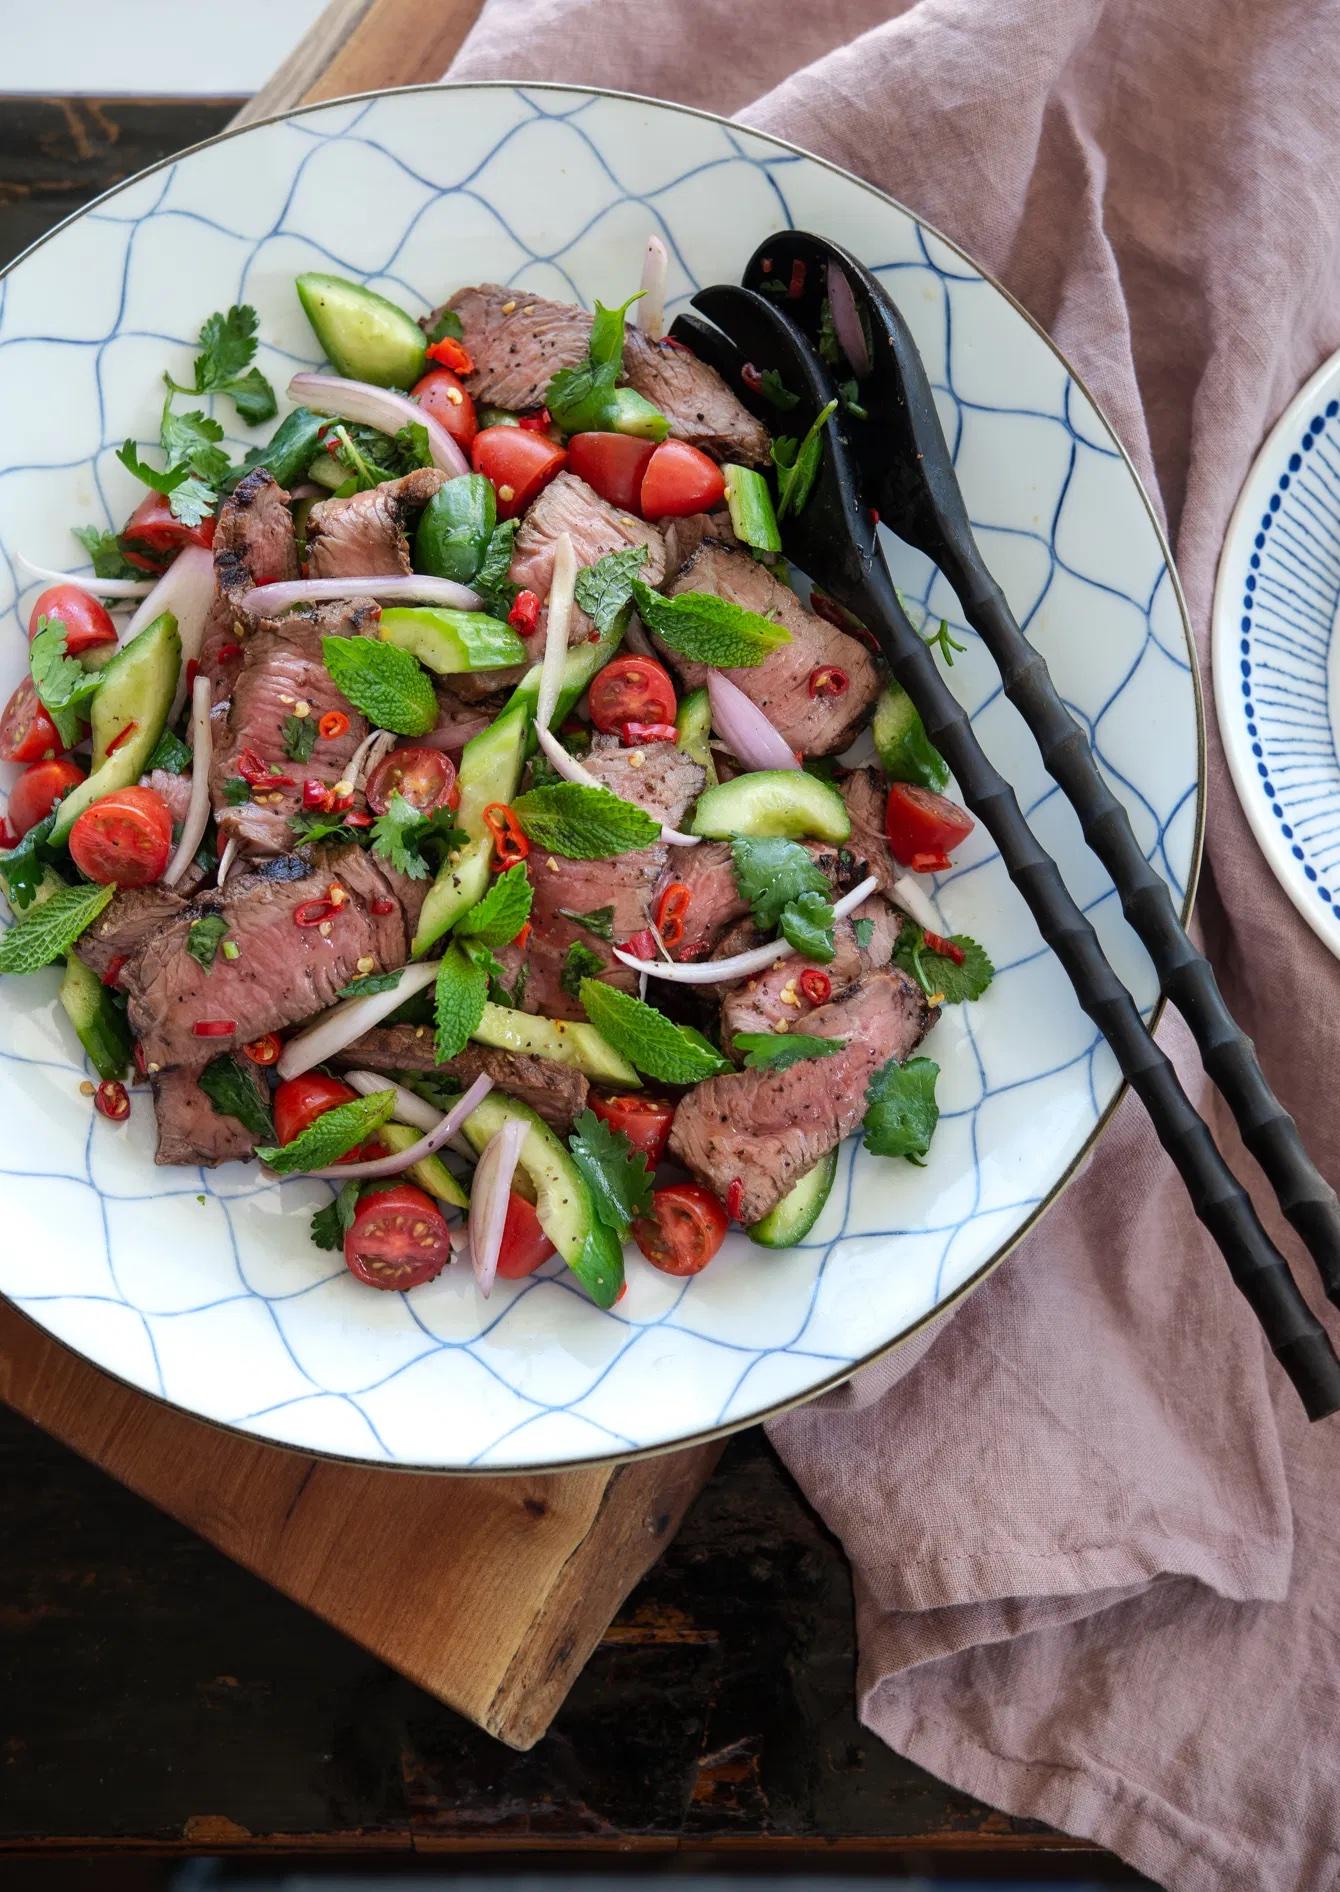 Weekly meal plan ideas: Thai Beef Salad at Beyond Kimchee